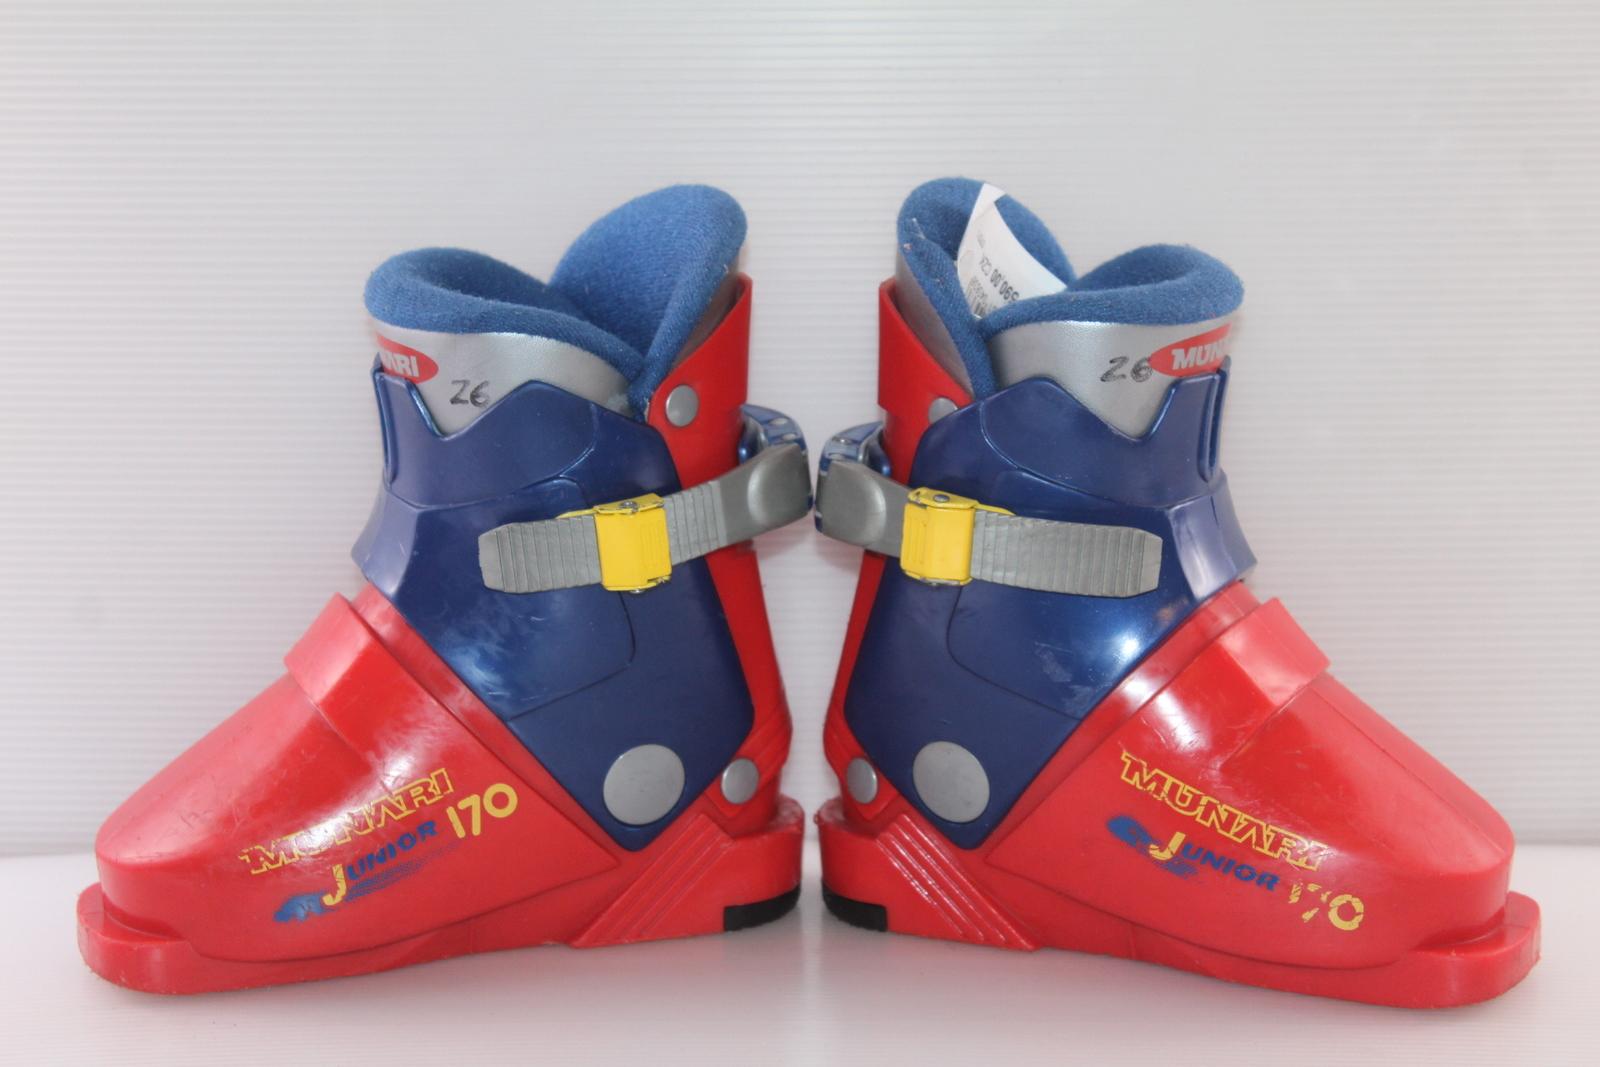 Dětské lyžáky Munari Junior 170 vel. EU26